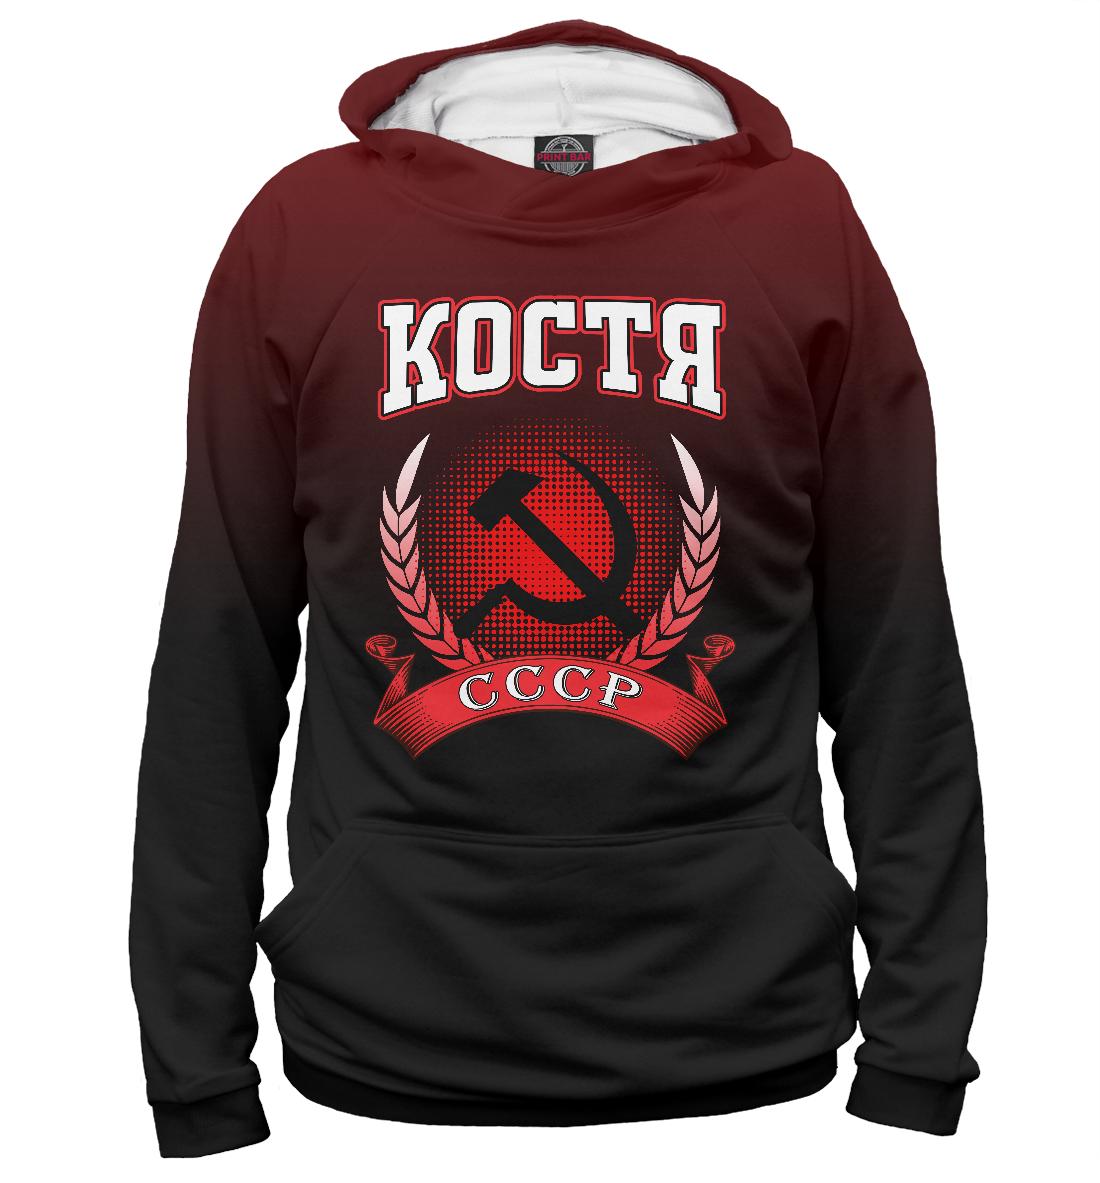 Купить Костя, Printbar, Худи, KST-896450-hud-2